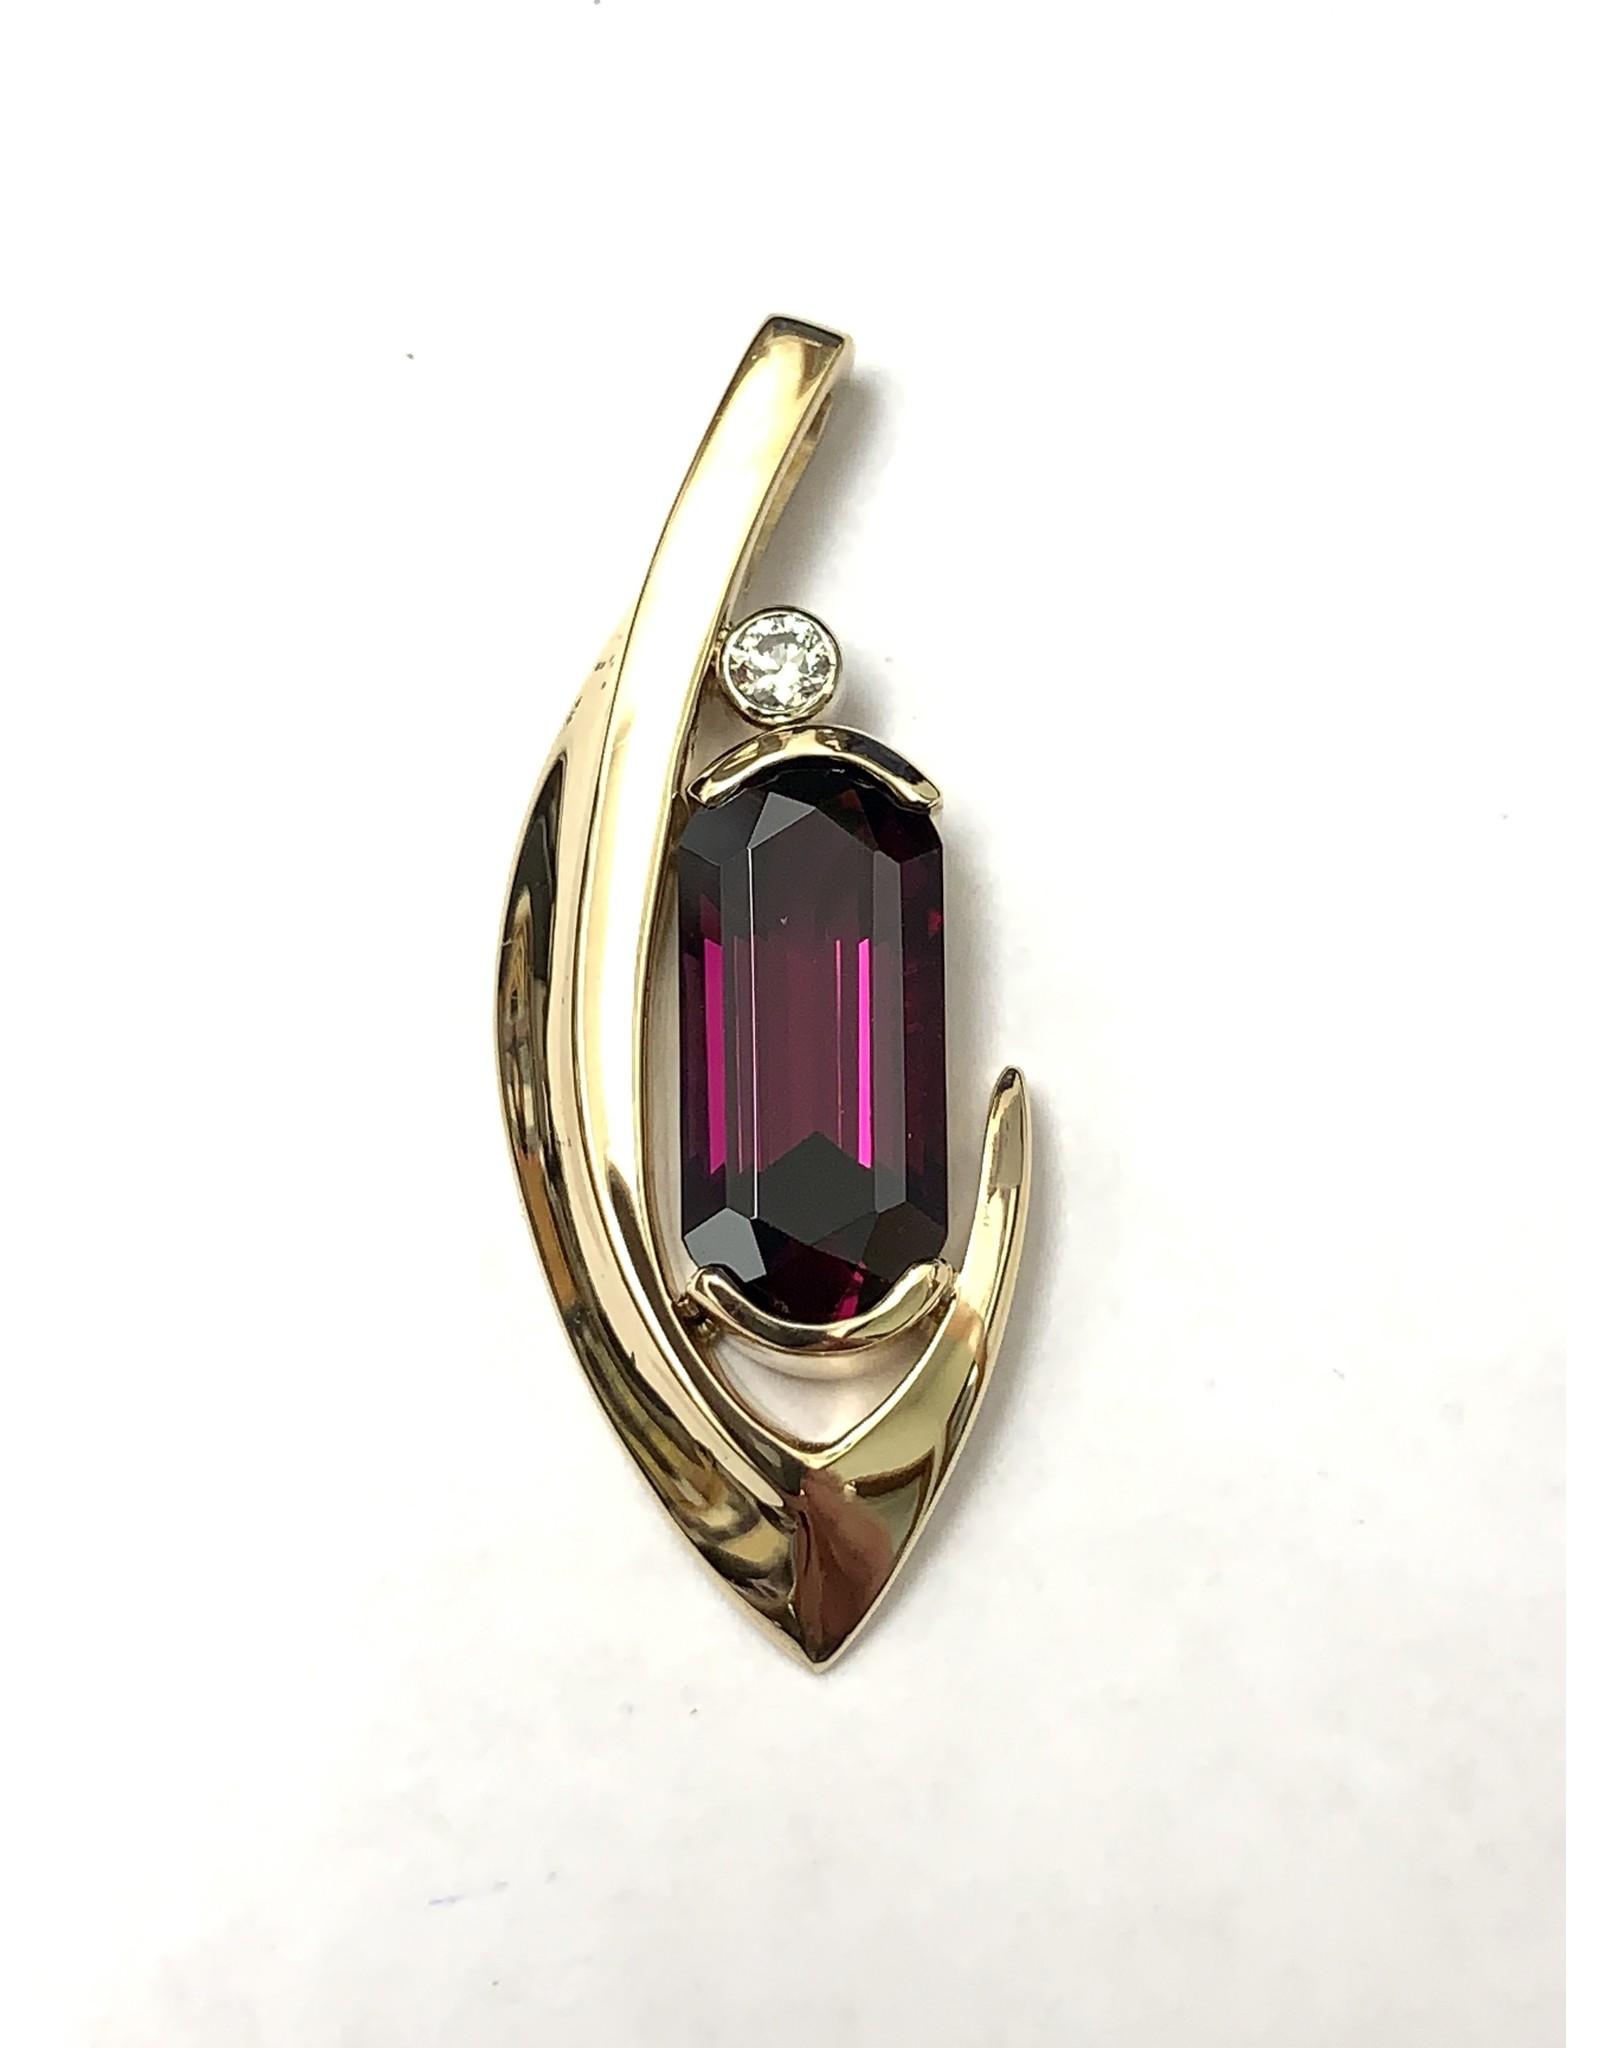 5.10ct Rhodolite Garnet & Diamond Pendant 14KY